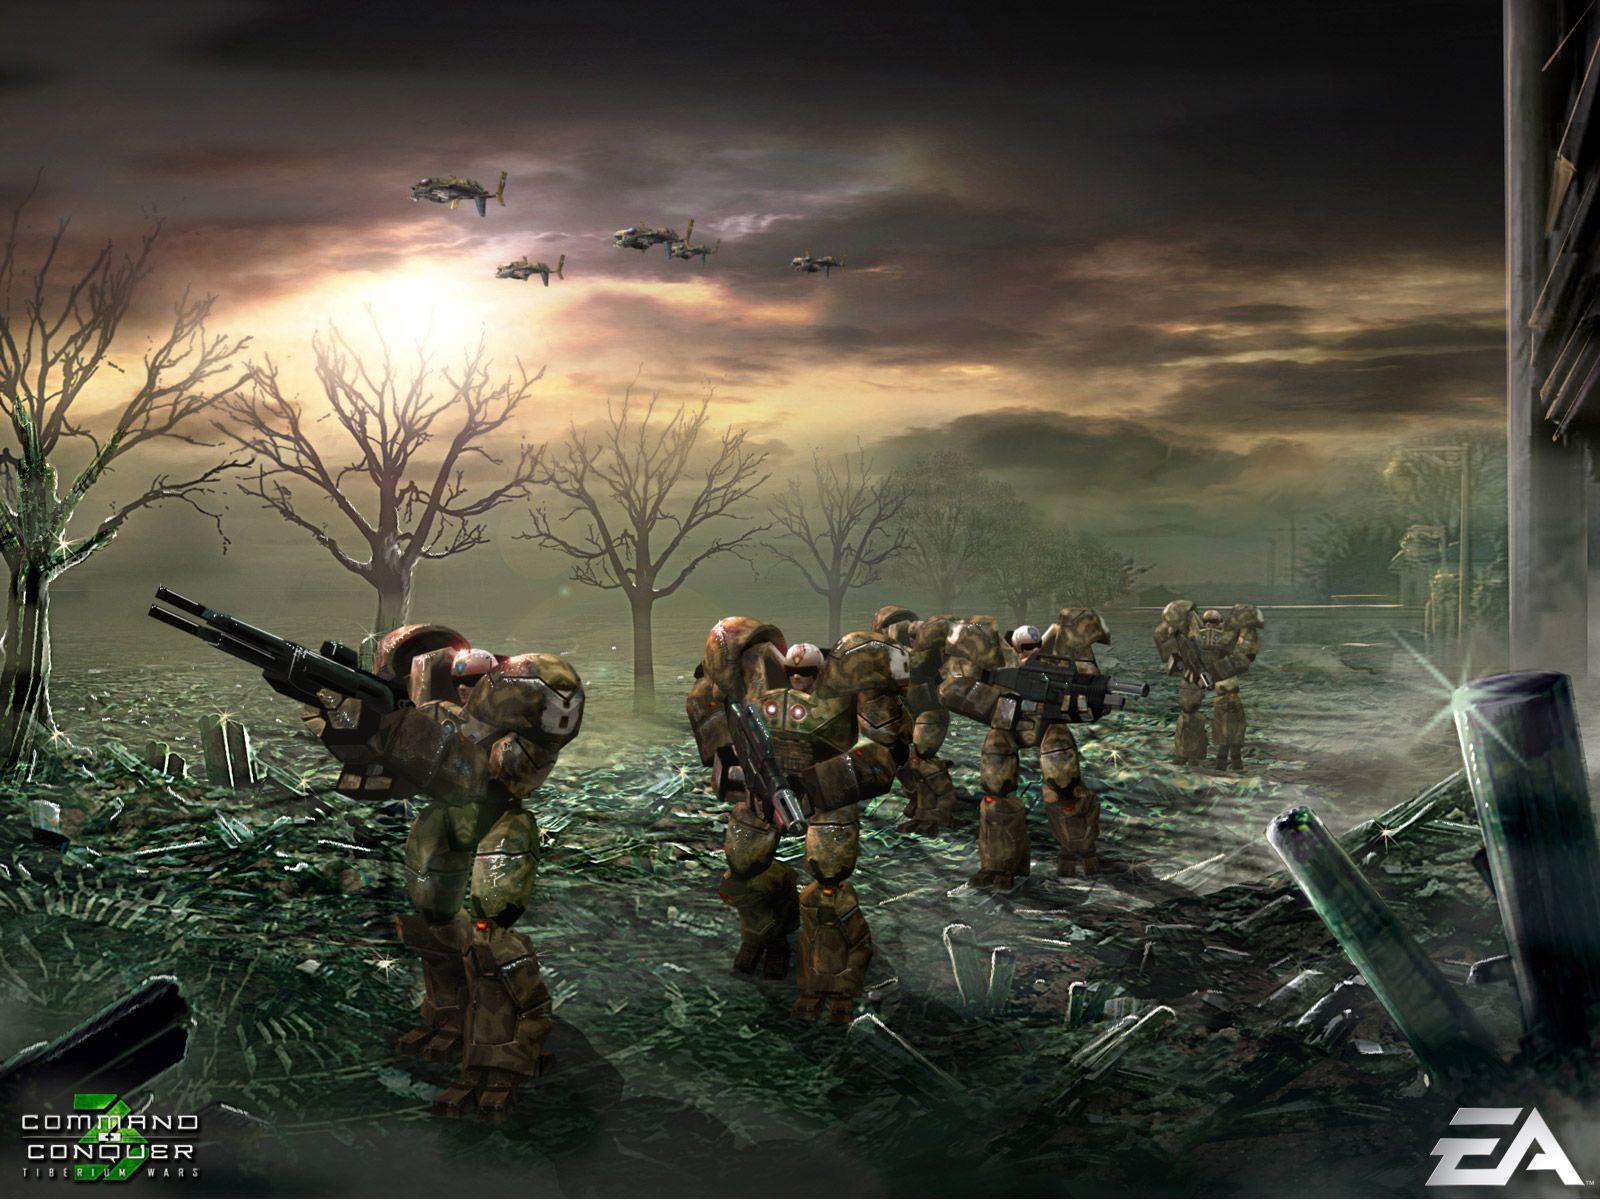 Command-Conquer-Kanes-WrathTiberium-Wars-Repack-wallpaper-wp3803936